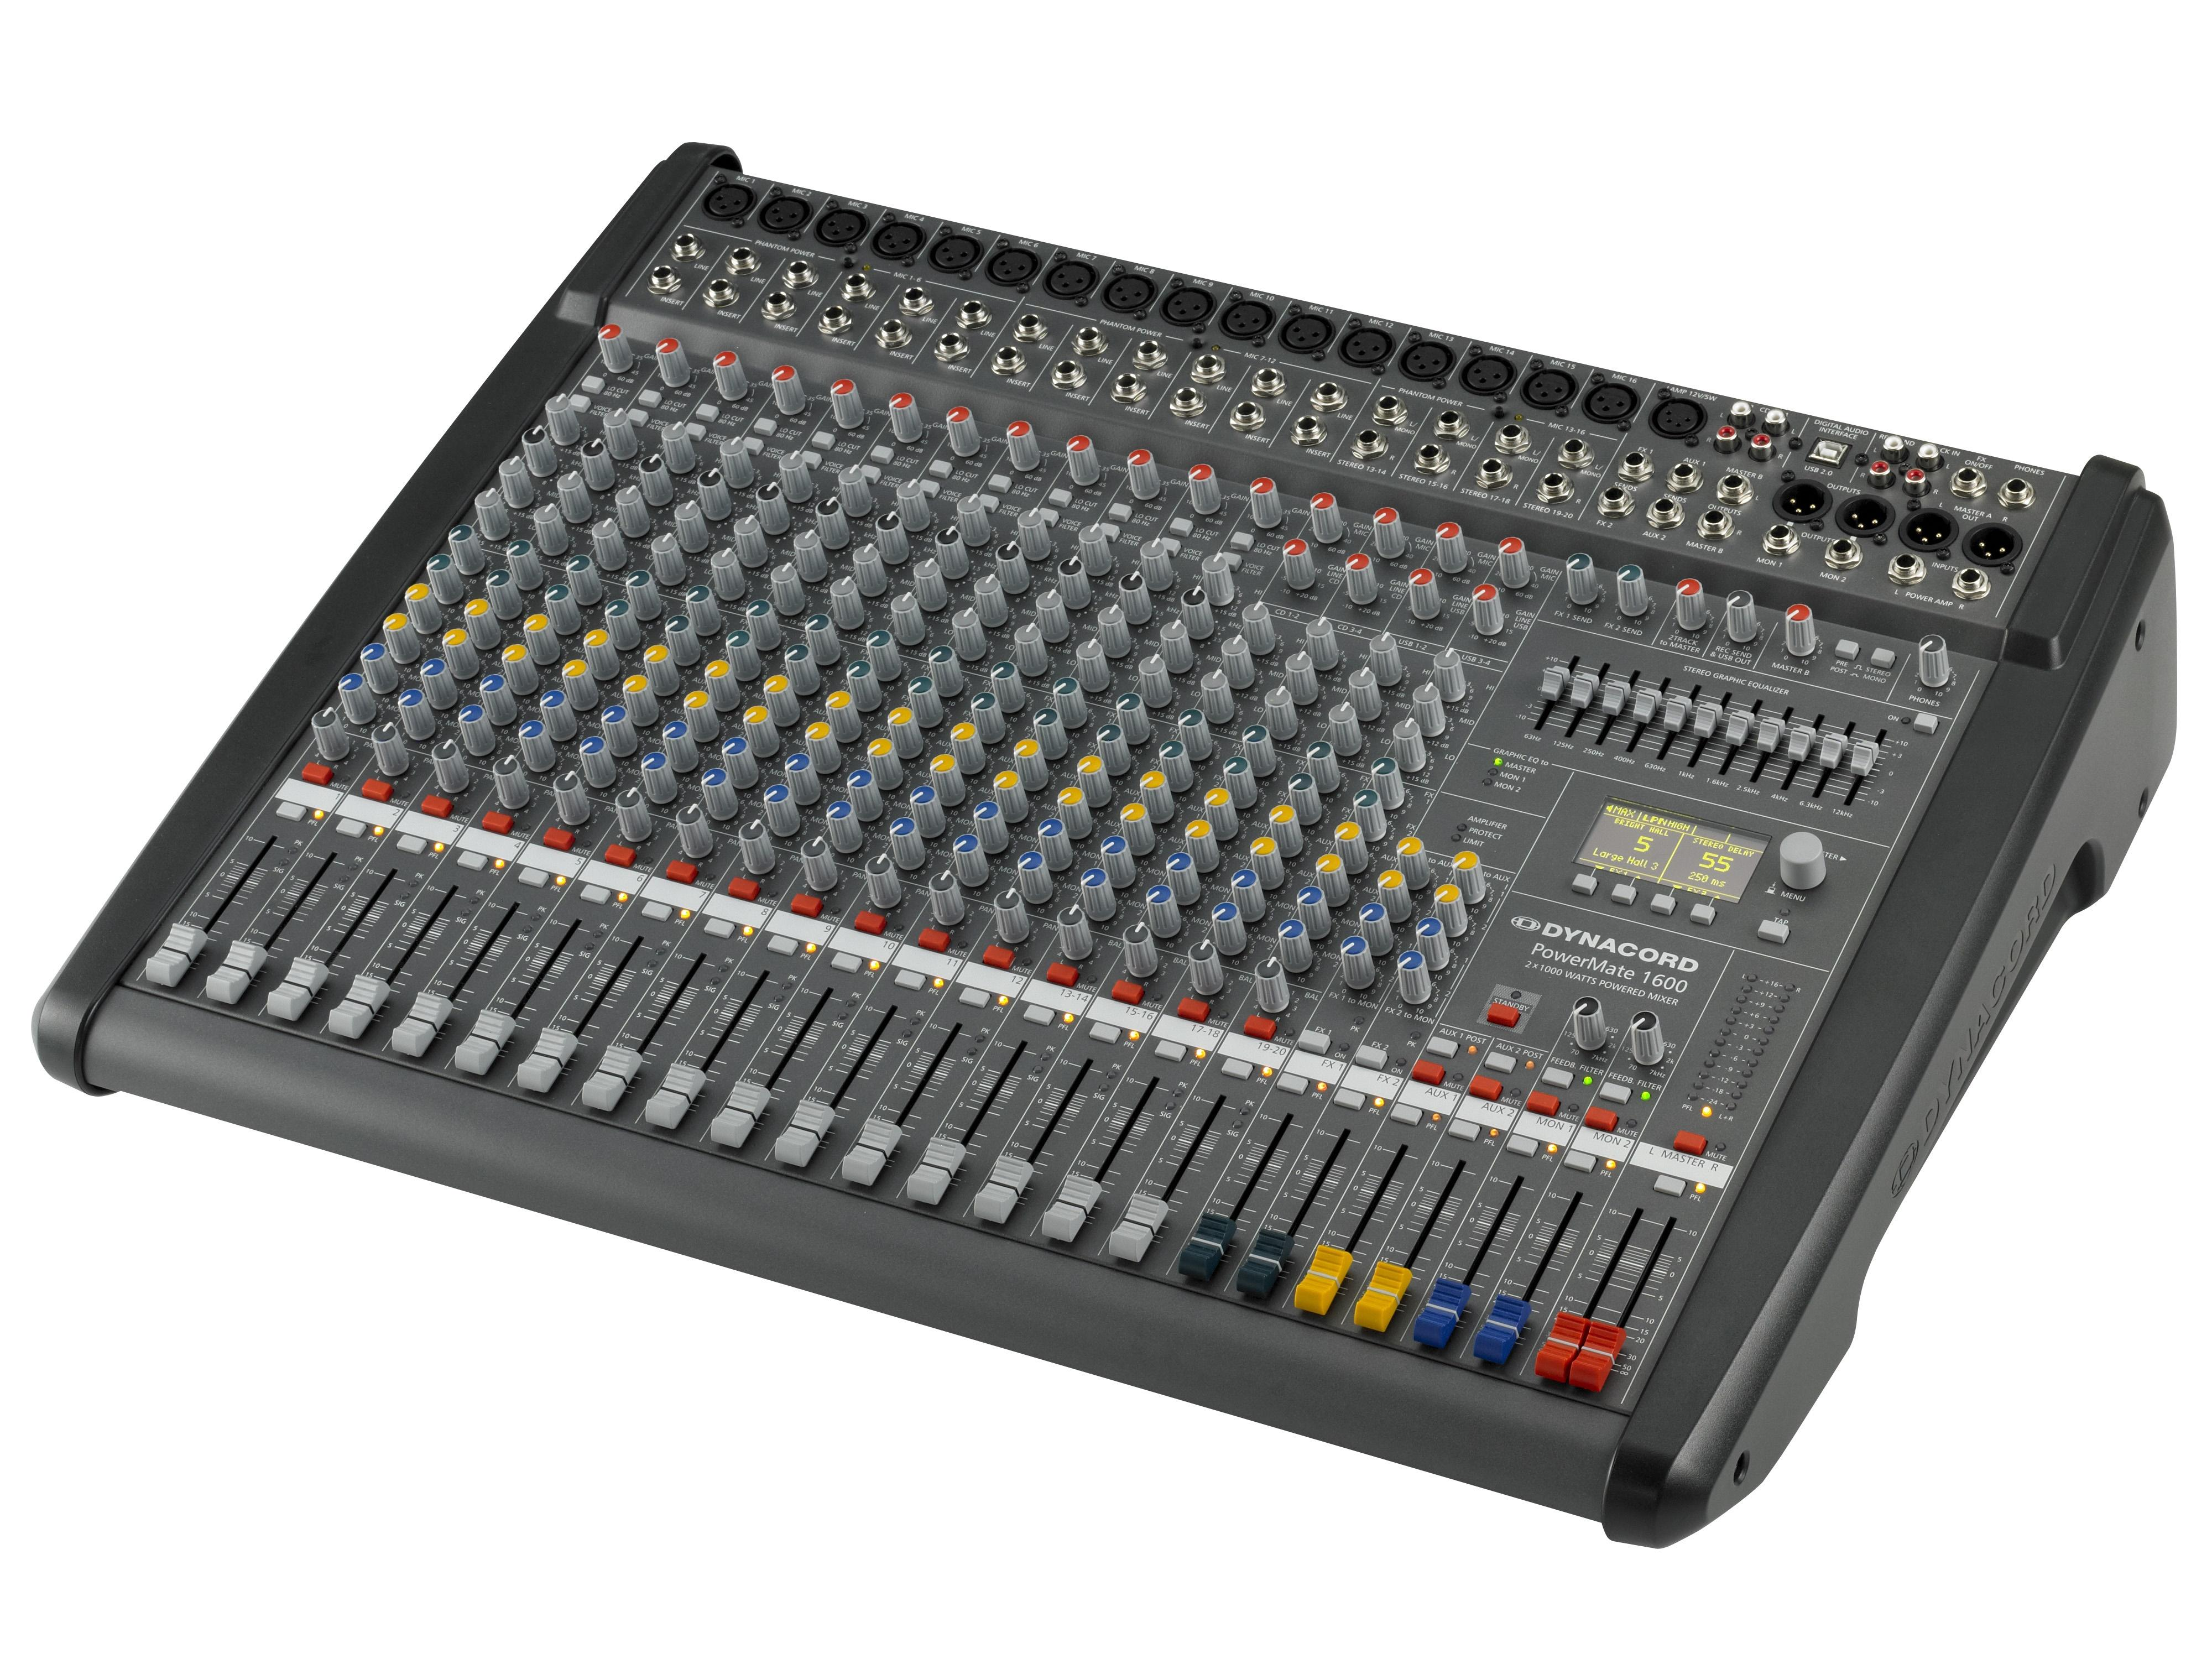 Dynacord DCPM16003UNIV Power Mixer/12 Mic/Line w 4 Mic/Stereo Line Channels/6xAUX/Dual 24 bit Stereo Effects/USB Audio Interface/Power Amp 2x 1000W